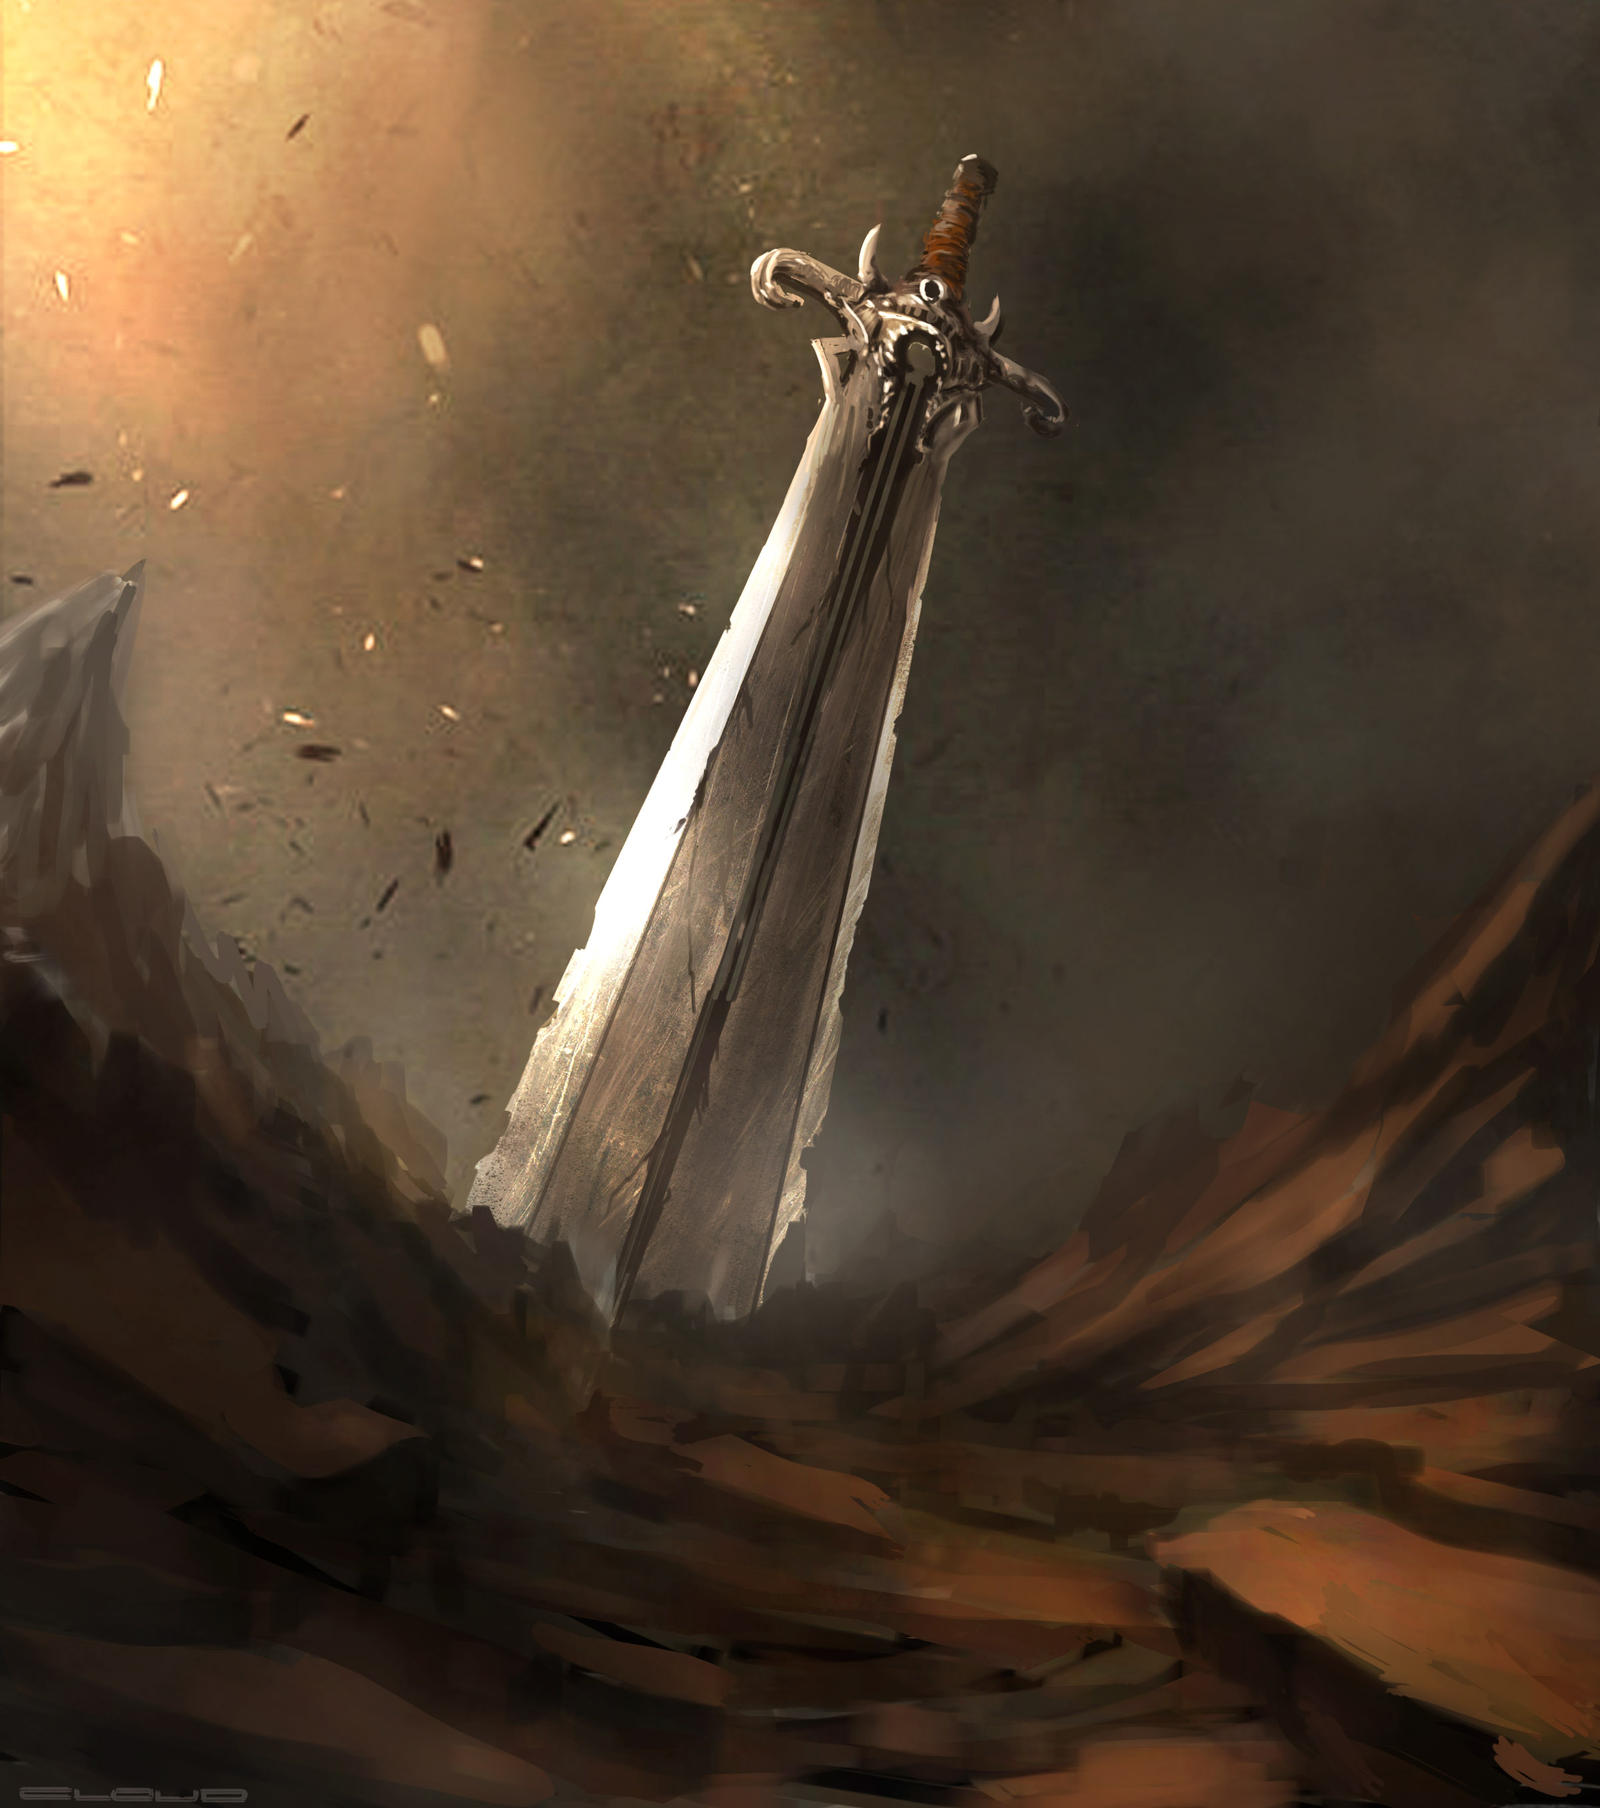 Sword of the Crusader by Darkcloud013